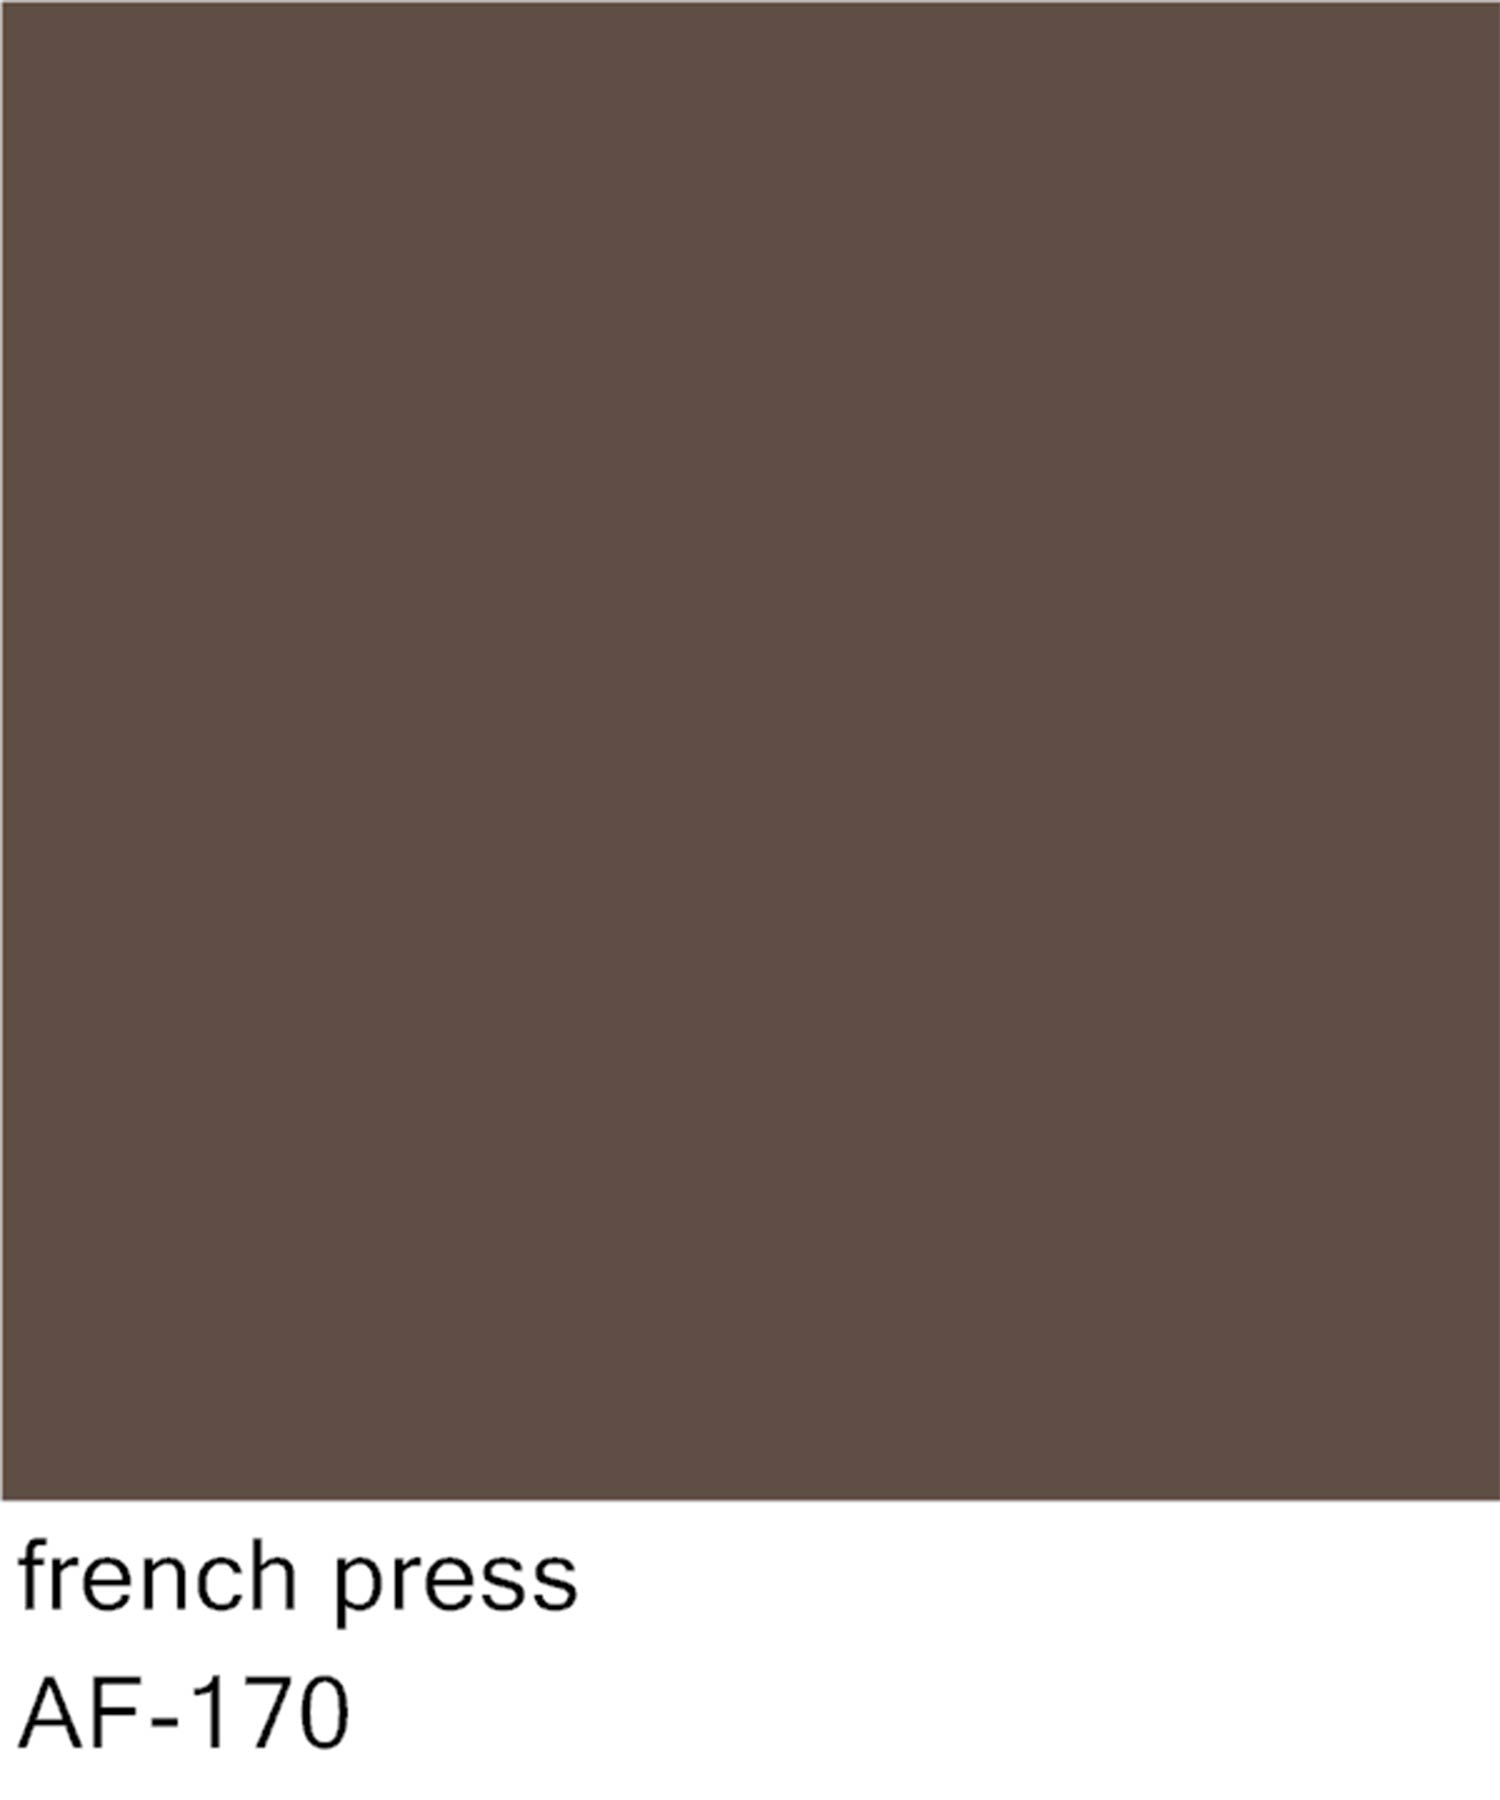 frenchpress_AF-170-OPT.jpg